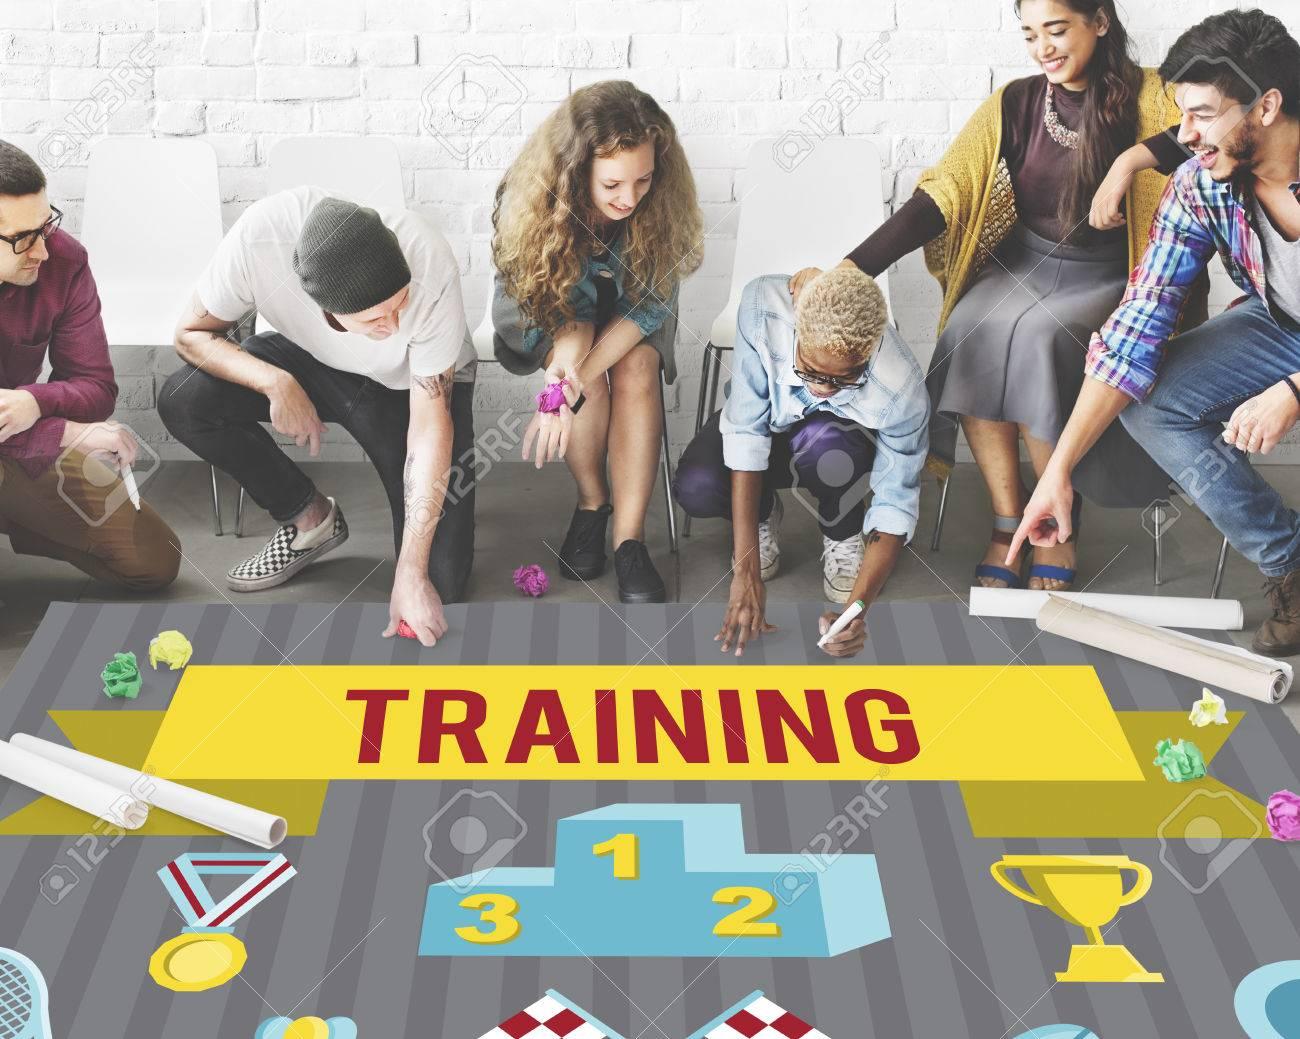 Winner Training Team Sport Event Graphic Concept - 61422468